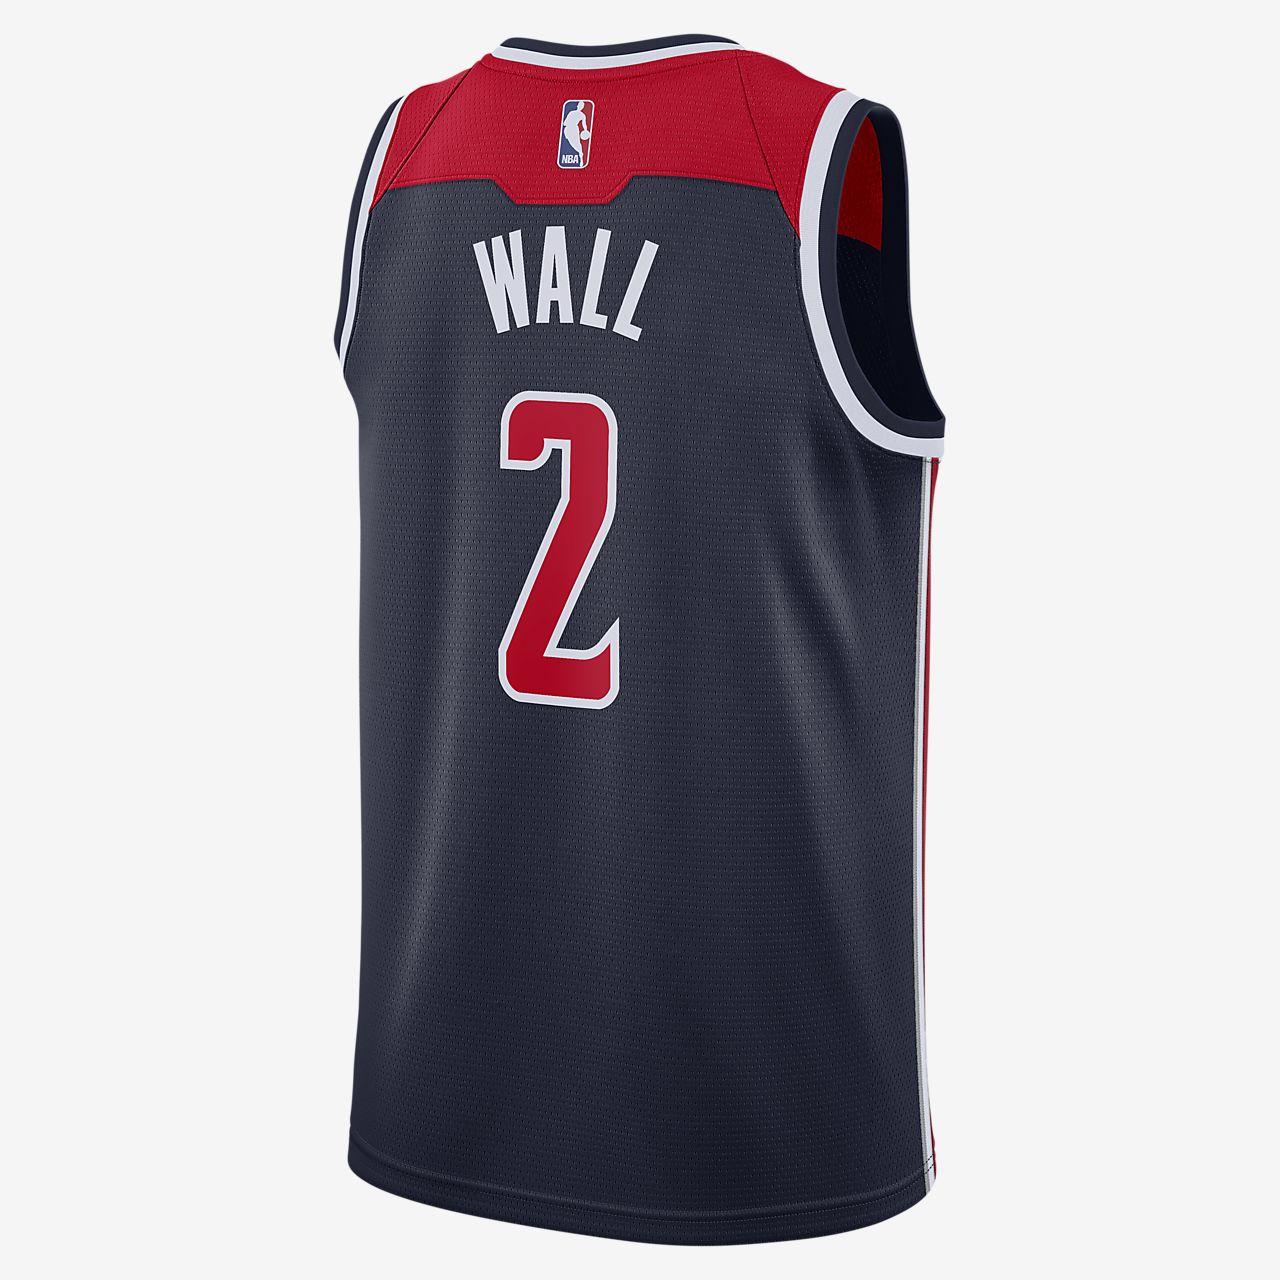 john wall jersey